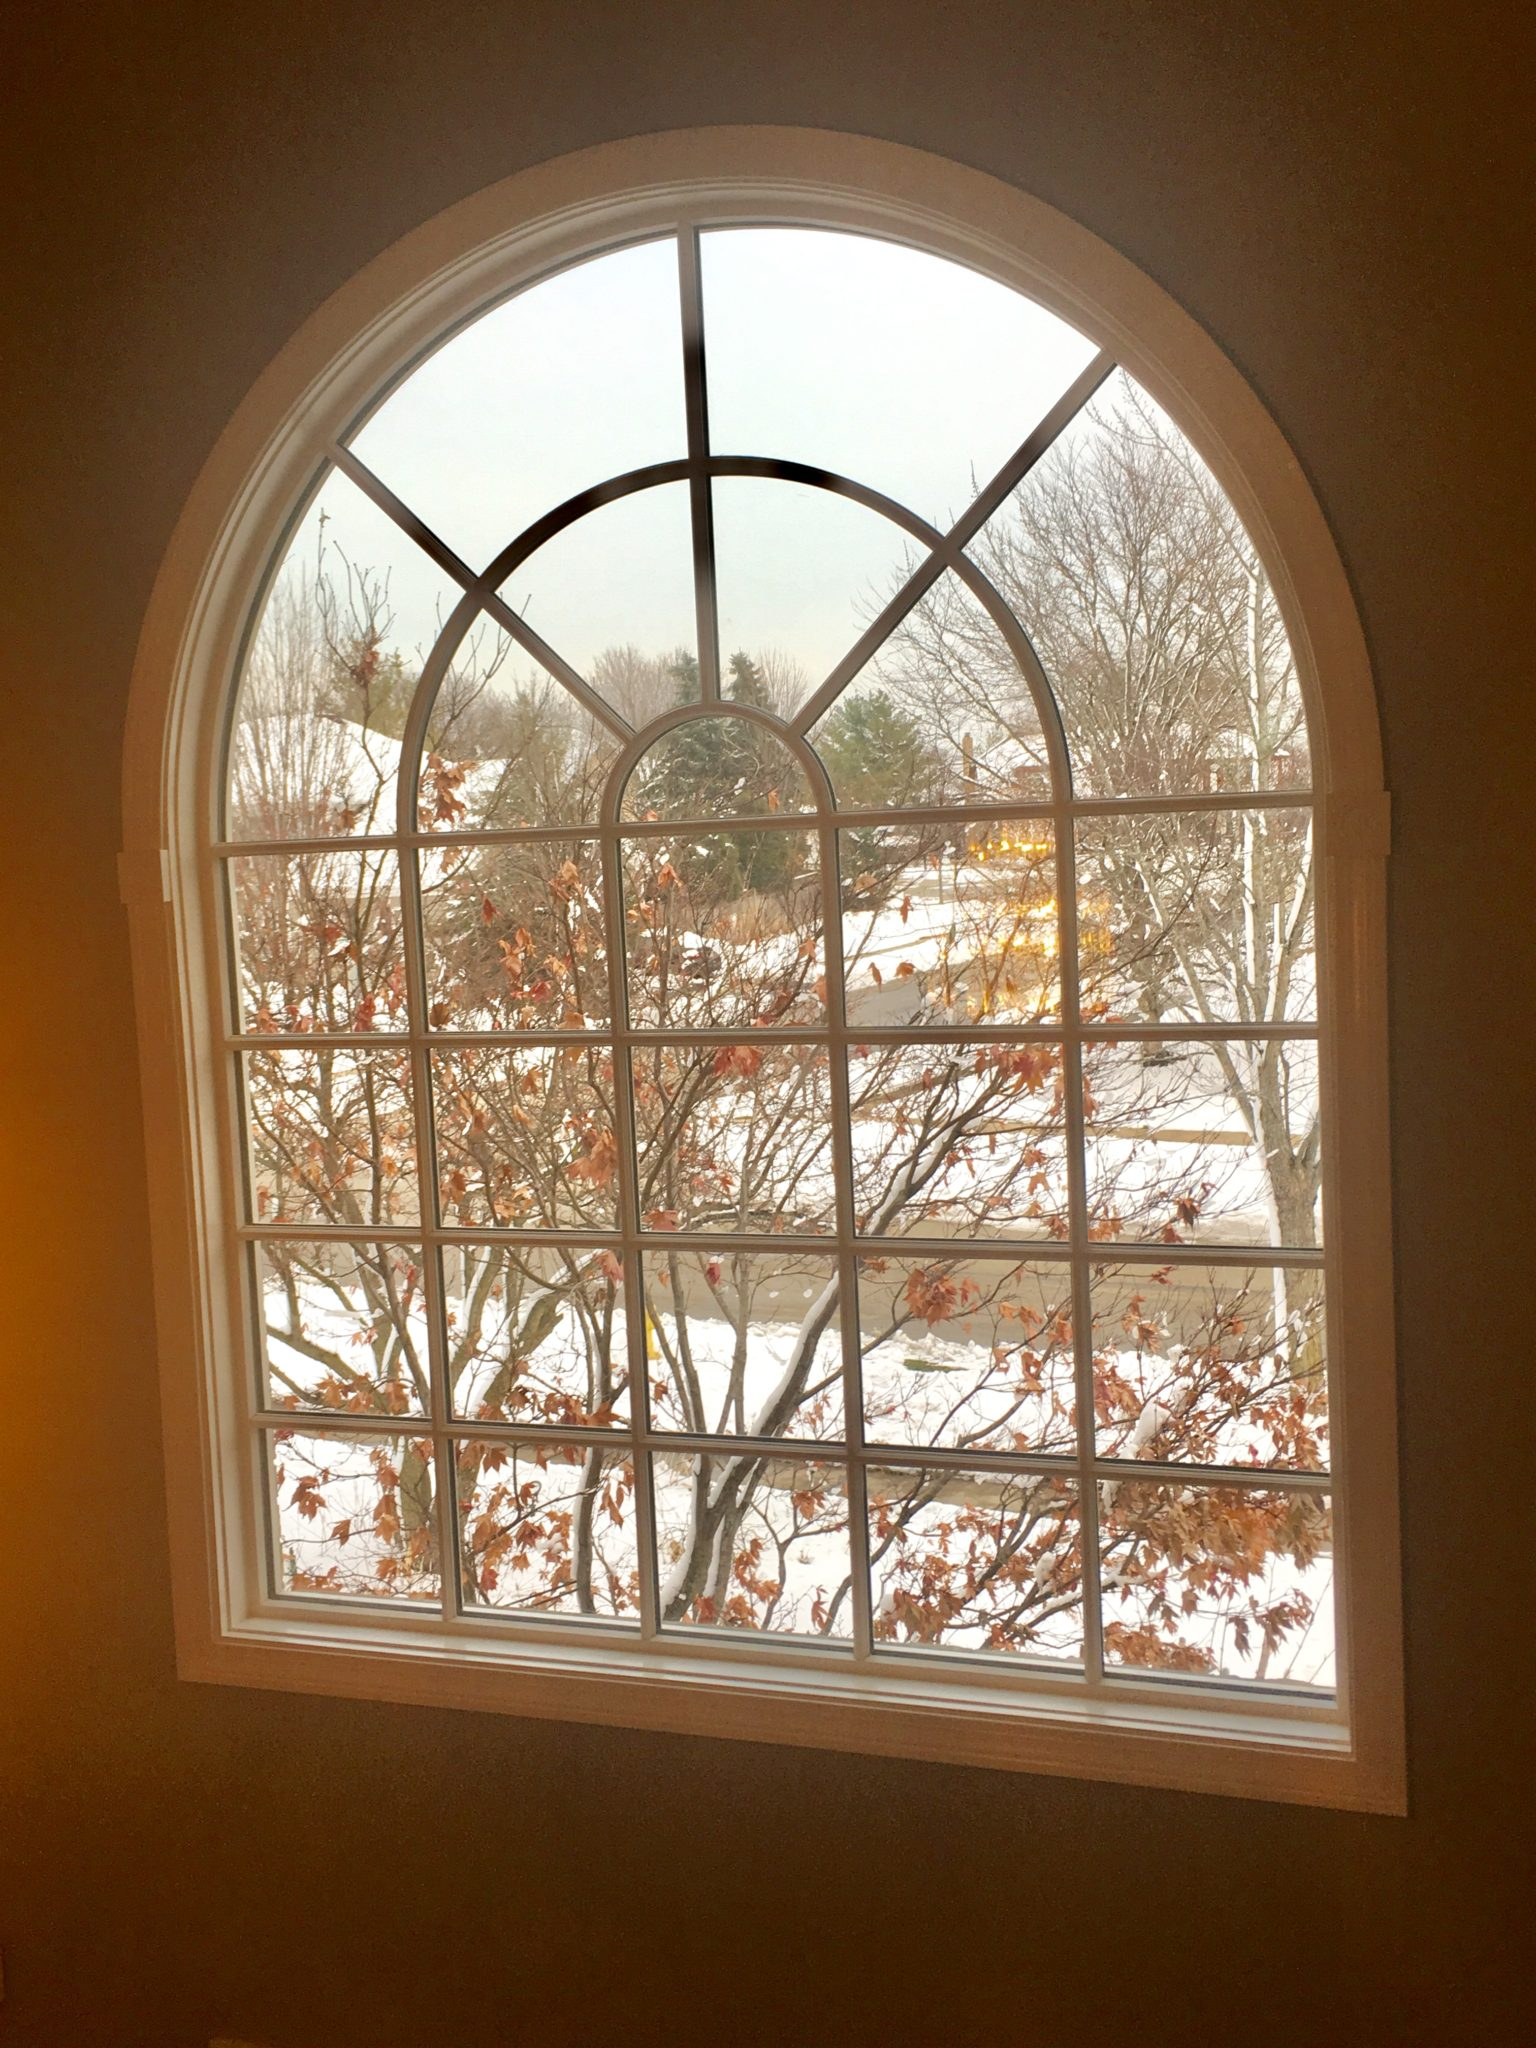 Pella windowsn installed in